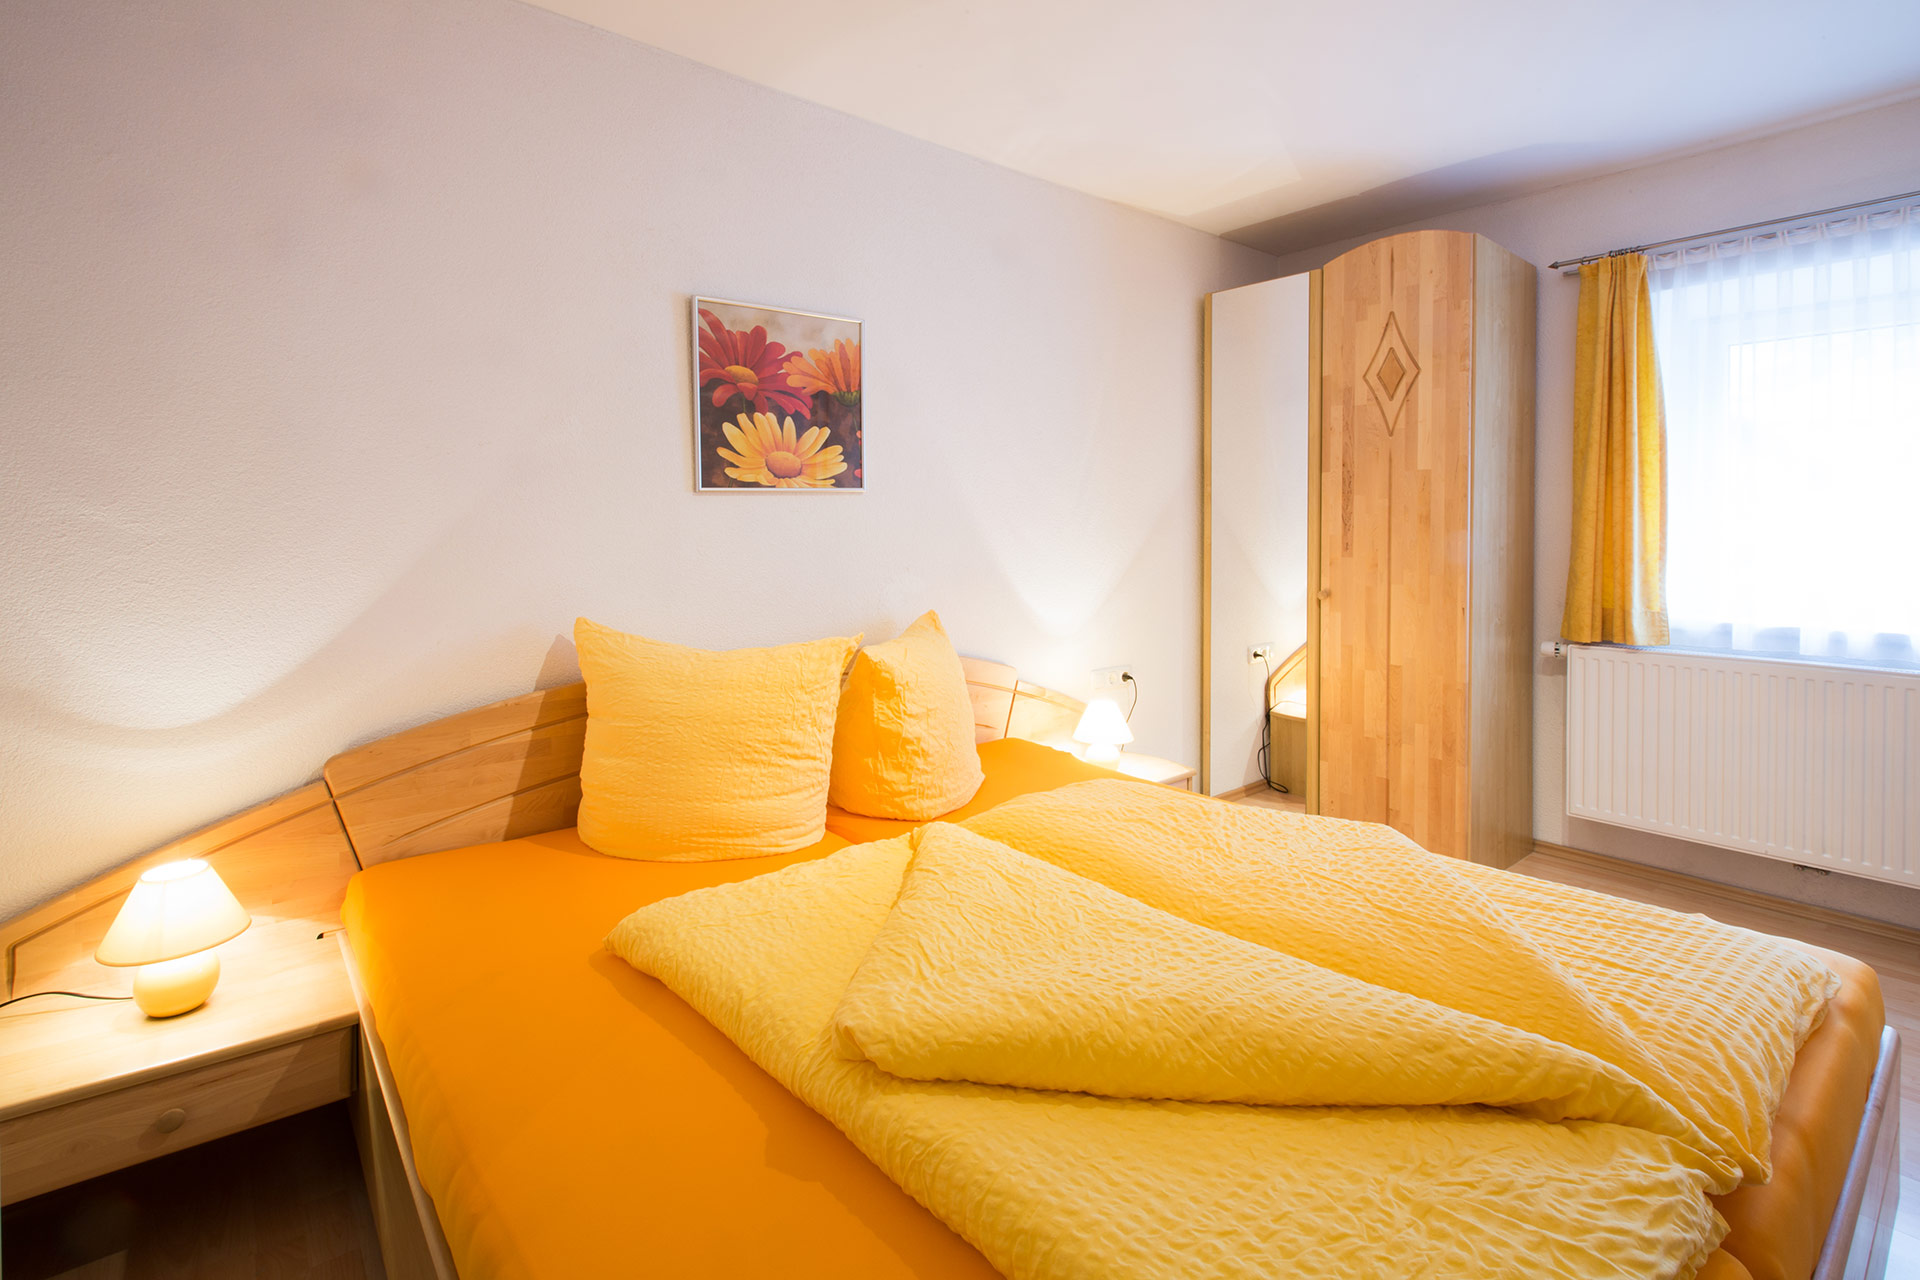 Aparthotel andreas hofer in kufstein hotels